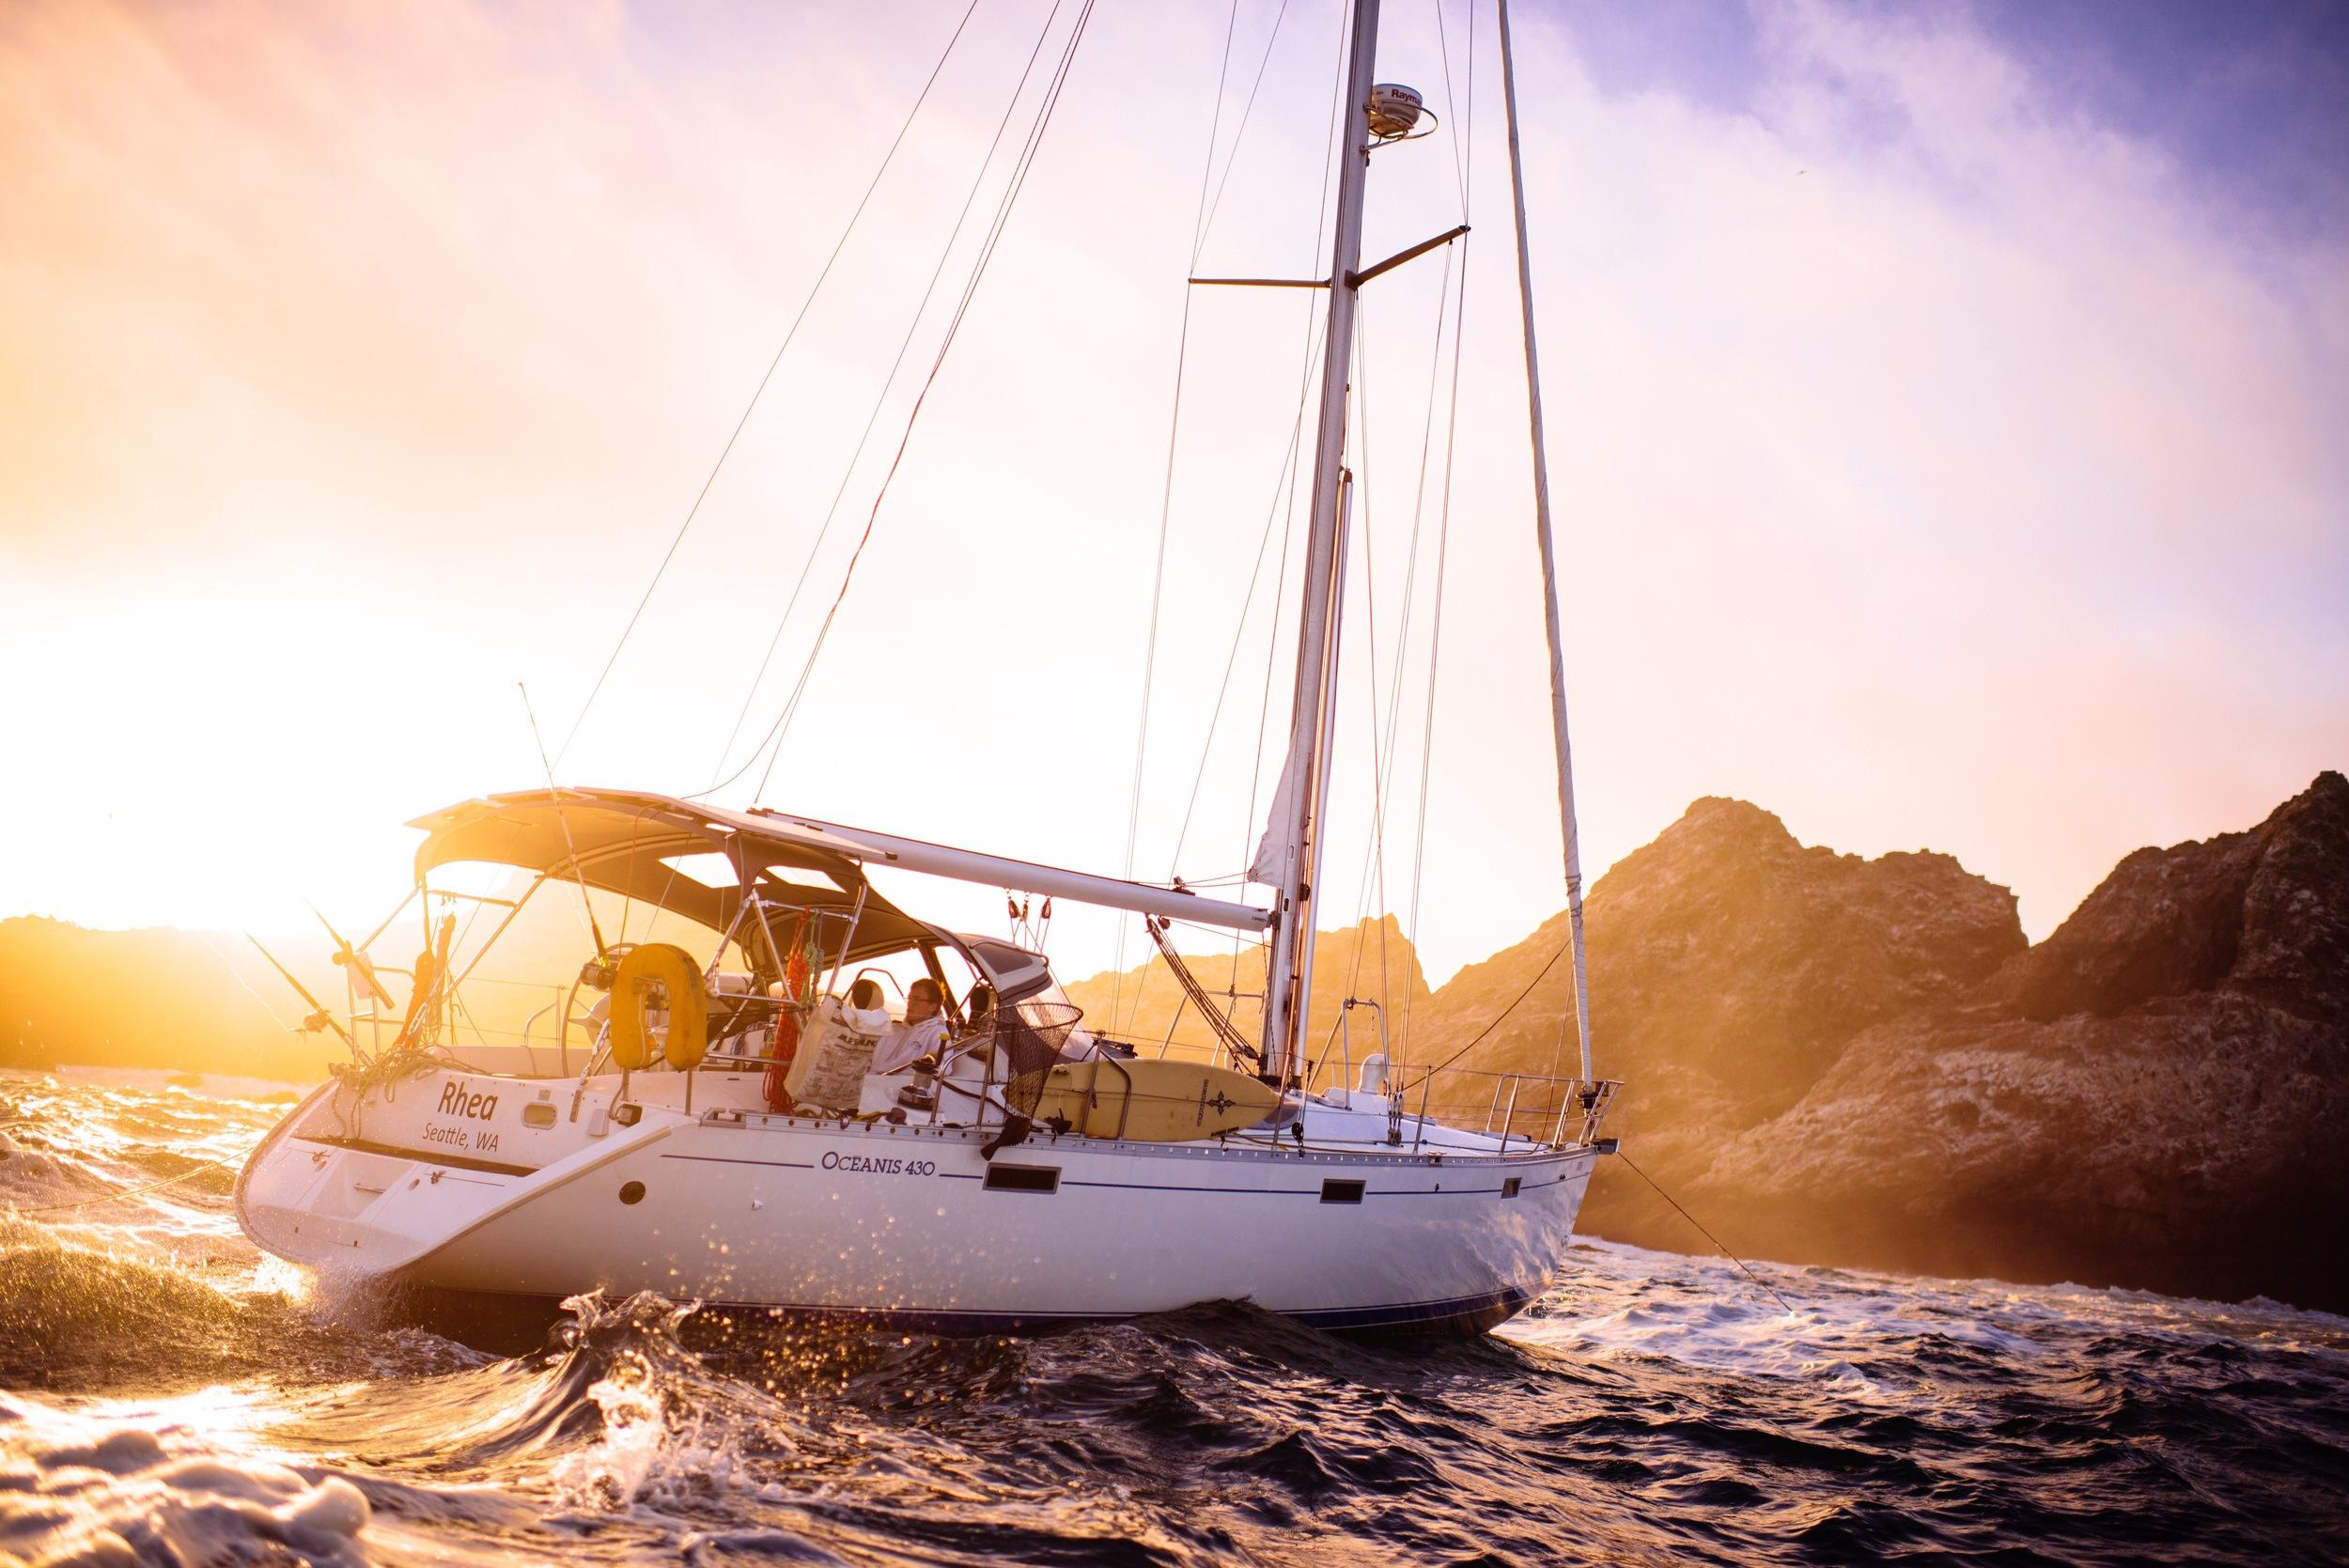 S/V Rhea  Anchored near the Farallon Islands.